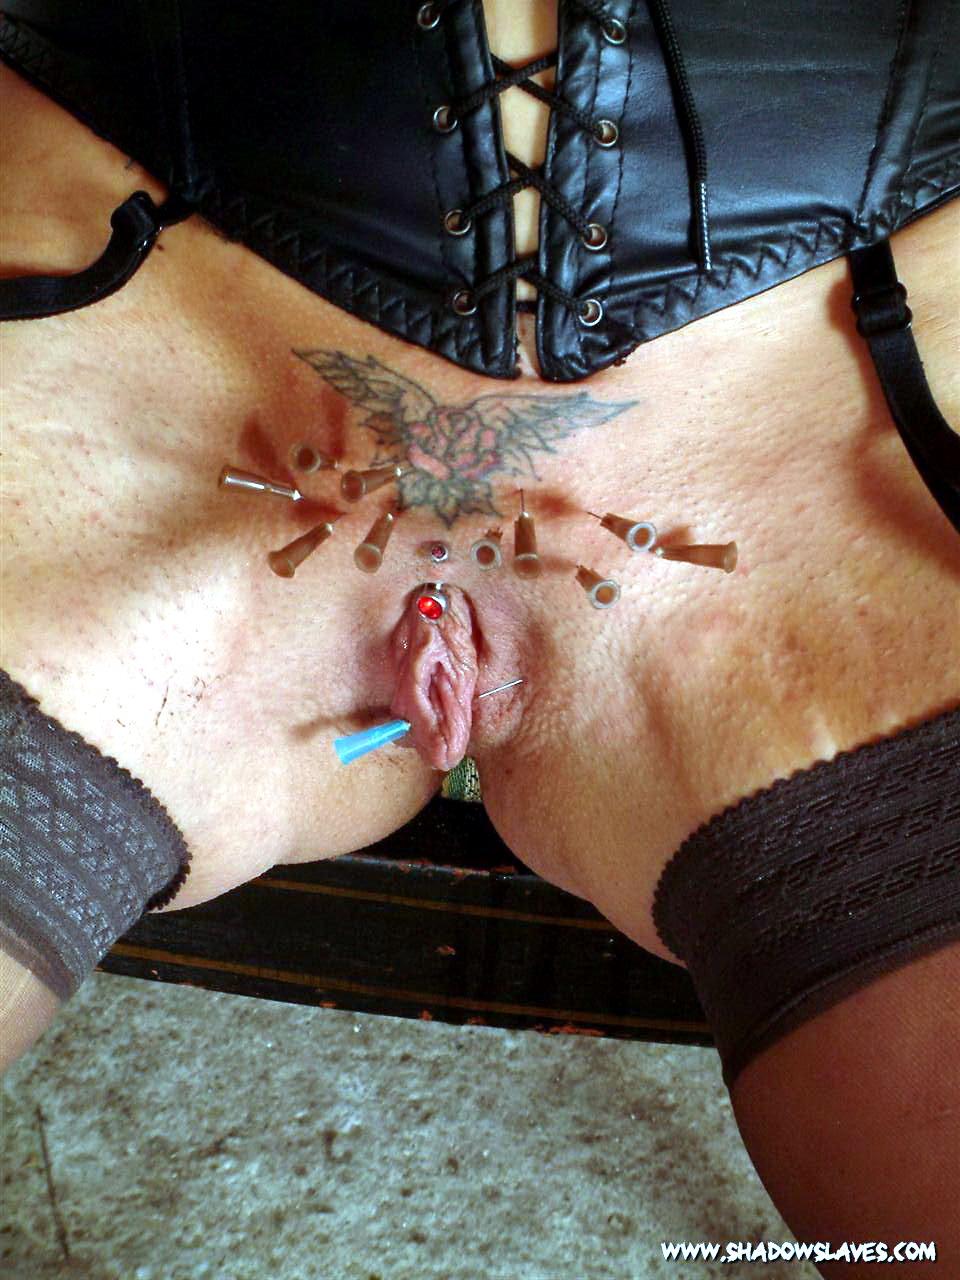 needle torture